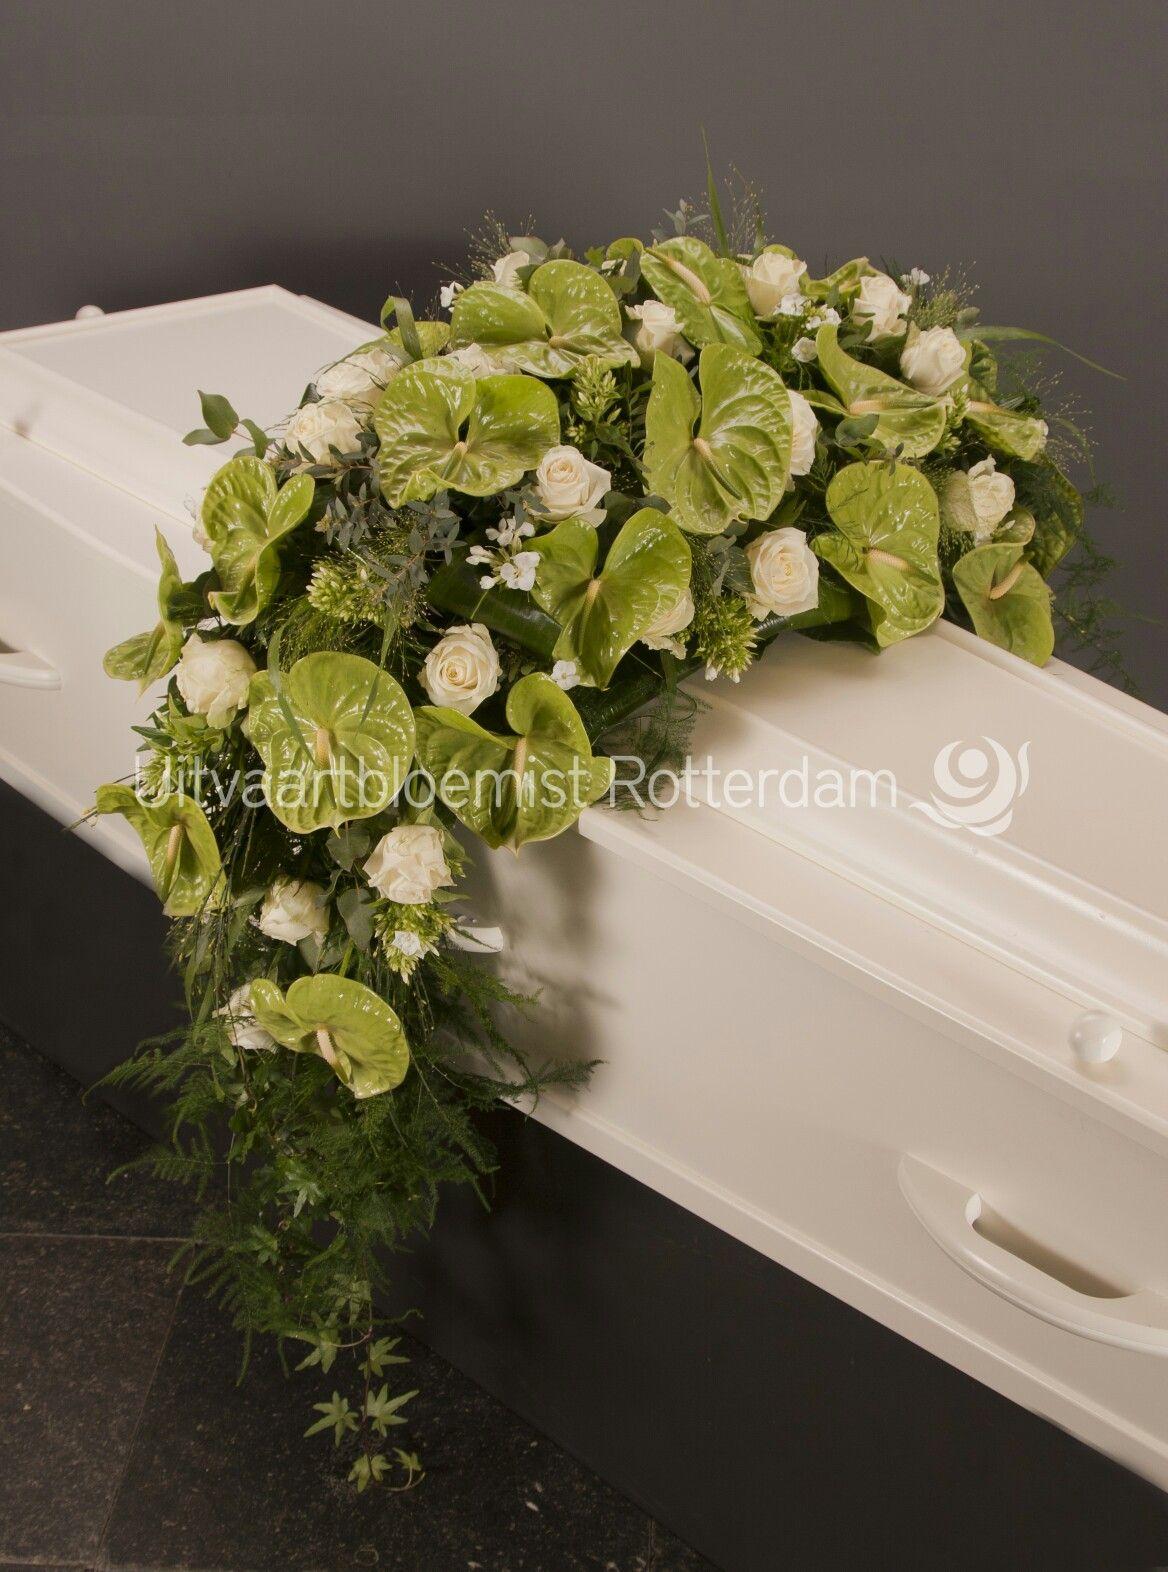 Modern • rouwbloemwerk • afhangend • kiststuk • rouwstuk • Anthurium • witte rozen • Avelanche •